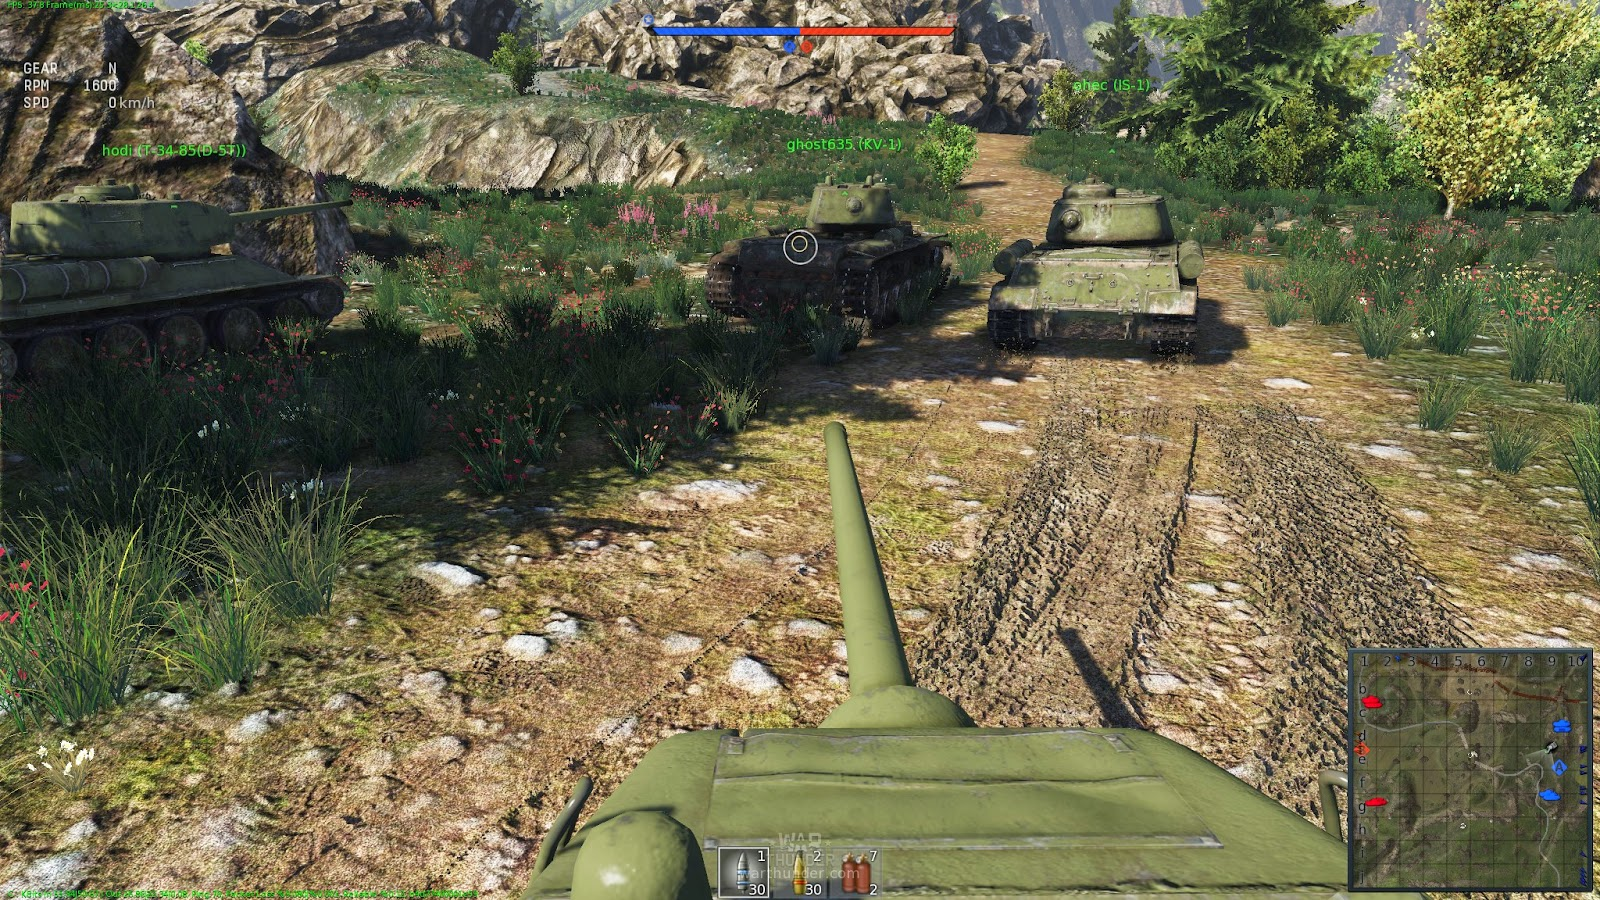 War Thunder Closed Beta Test Shot+2014.04.08+19.34.45